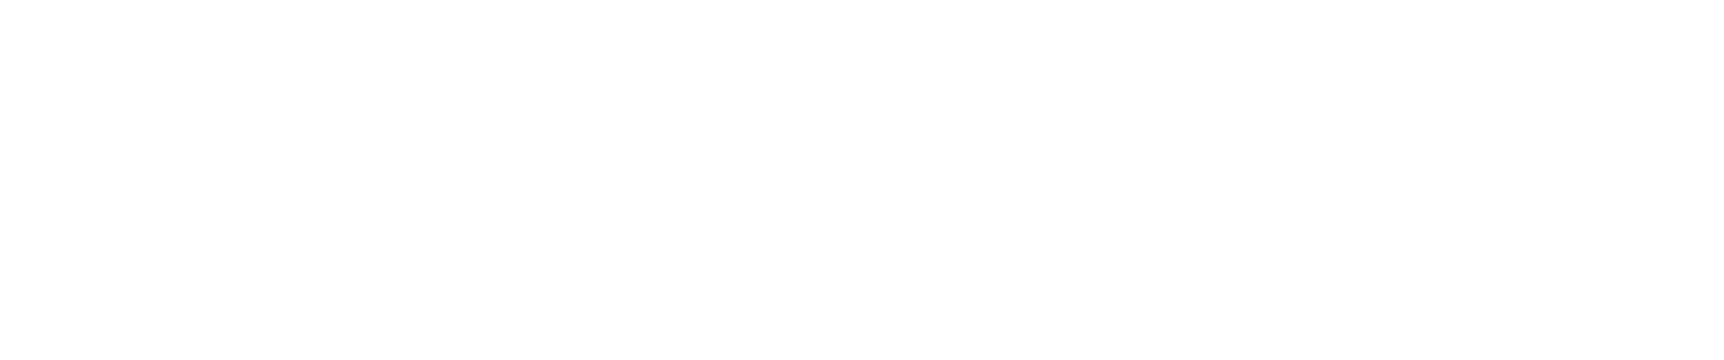 Executech Logo White 2-1